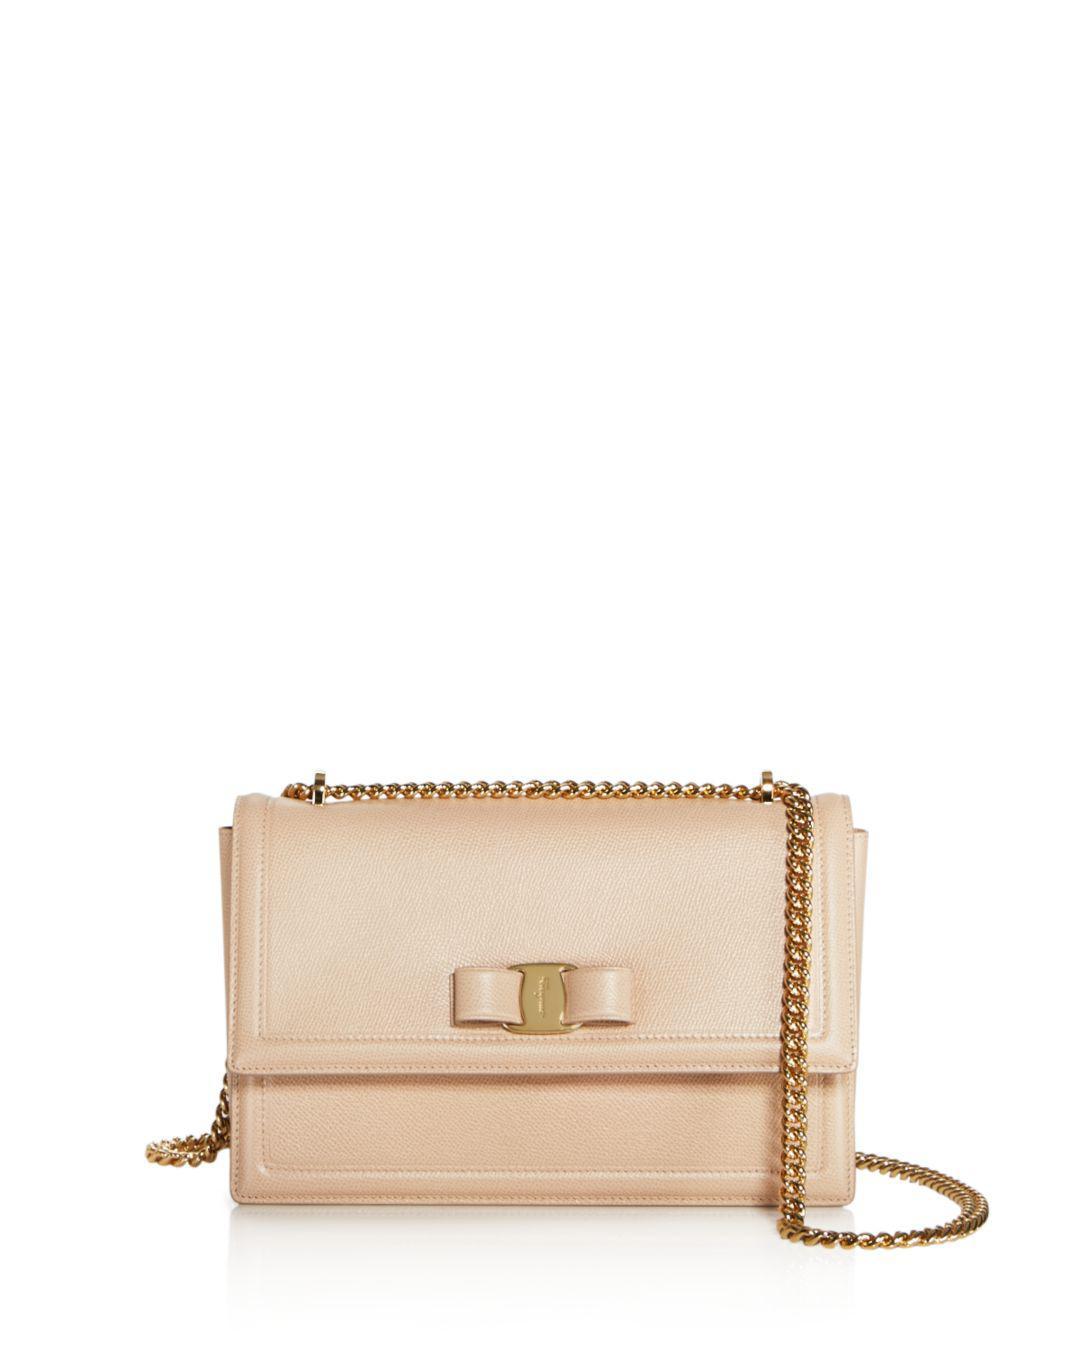 06c401883962 Ferragamo. Women s Ginny Medium Saffiano Leather Shoulder Bag